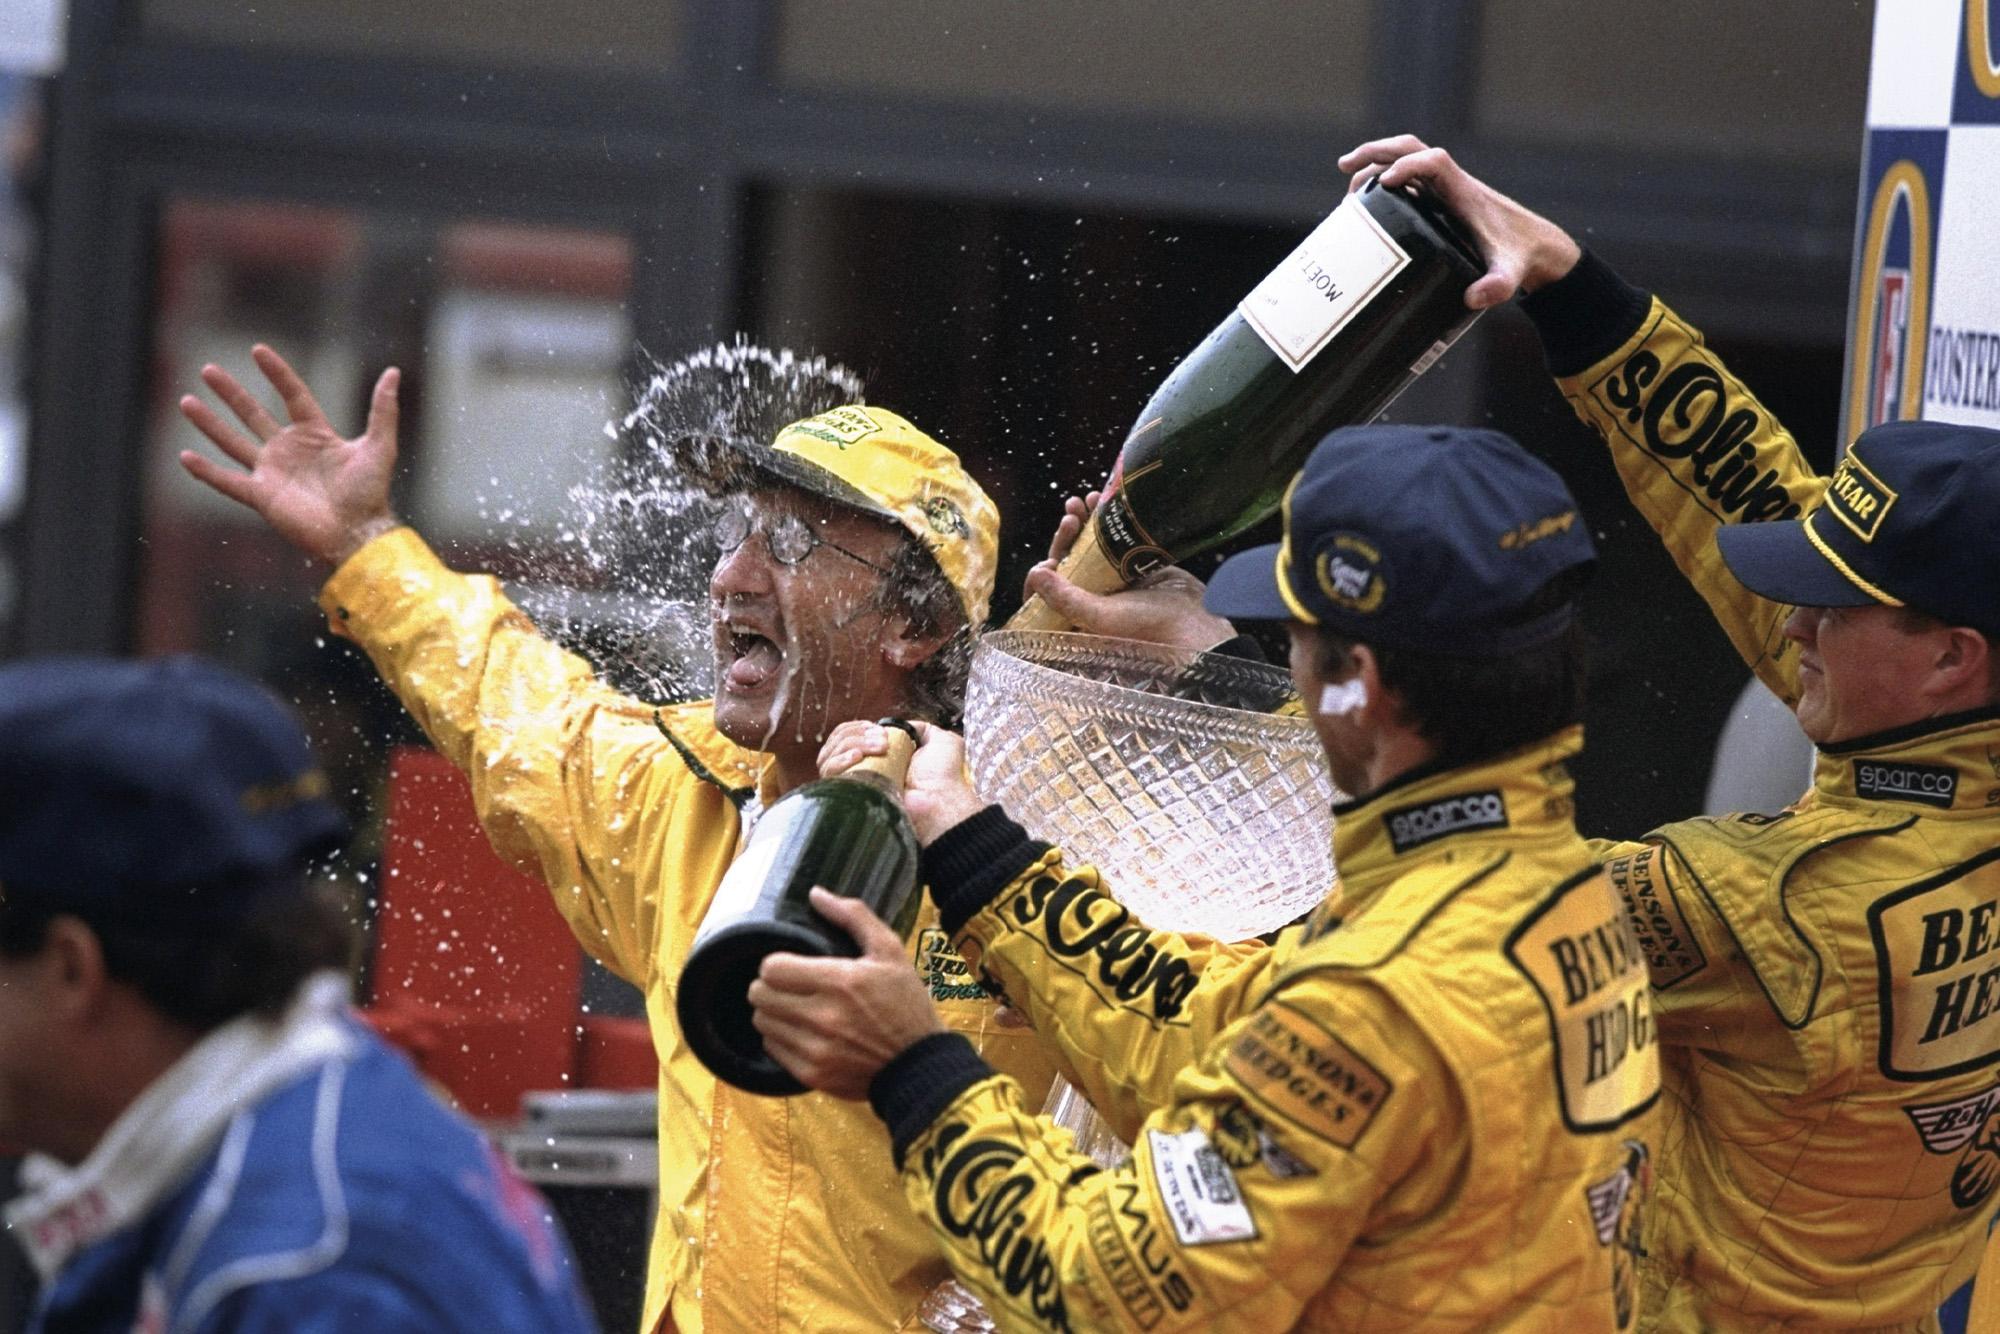 Eddie Jordan celebrates victory at the 1998 Belgian Grand Prix